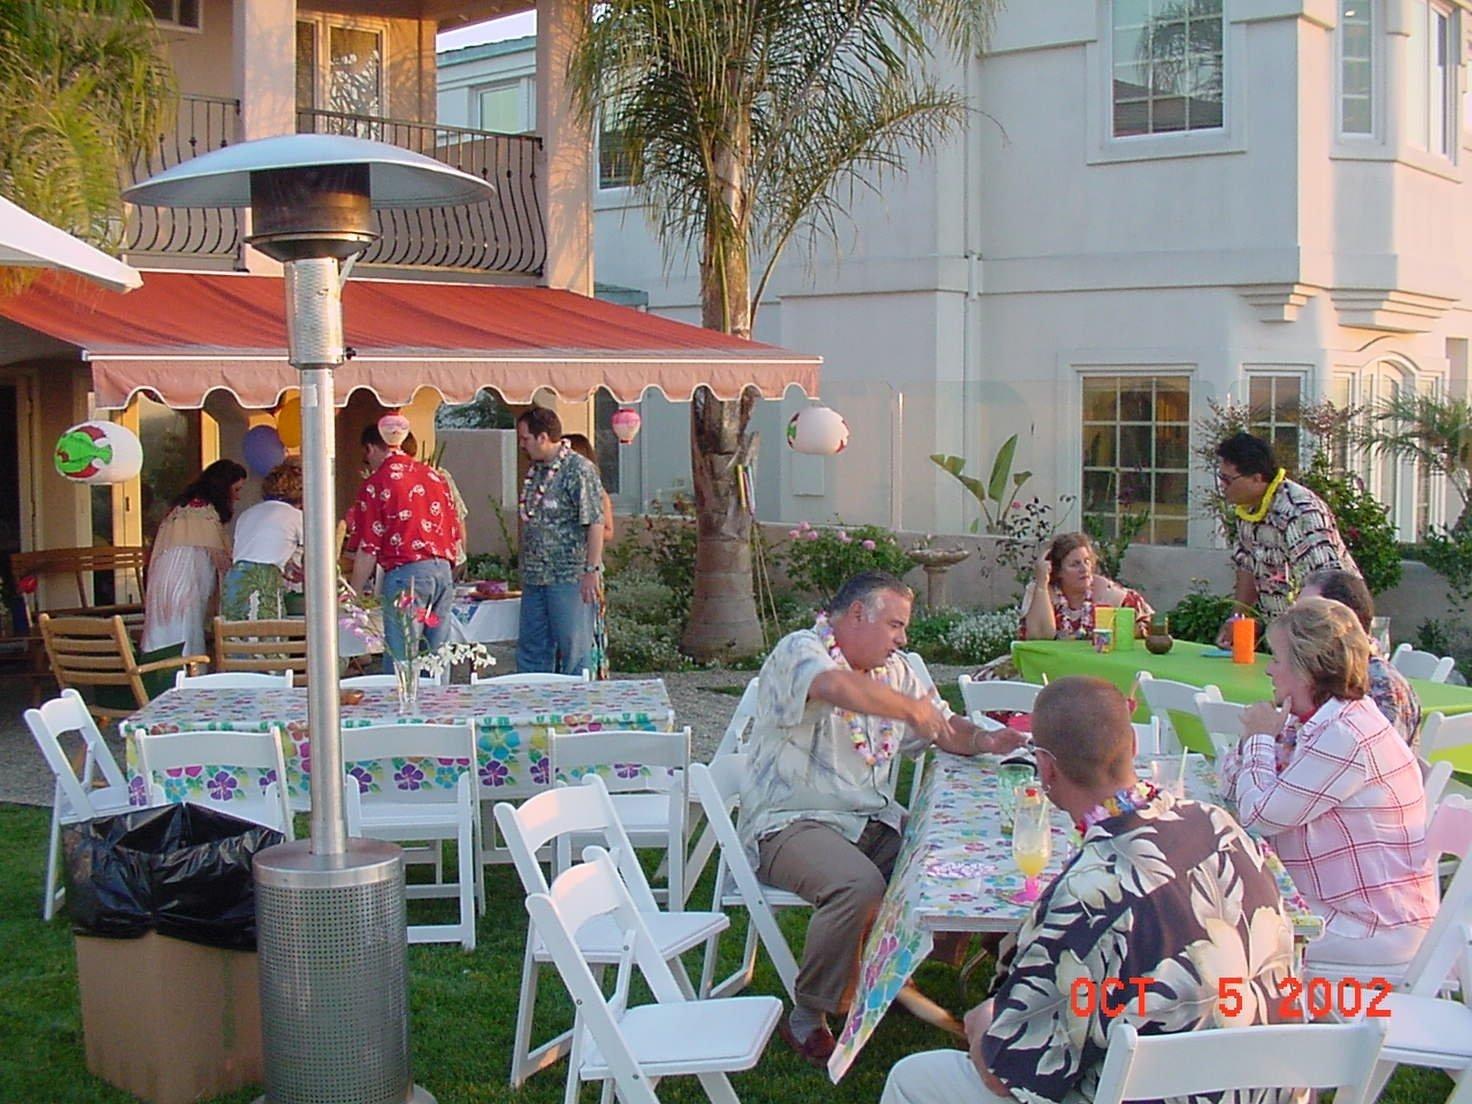 10 Stylish Backyard Birthday Party Ideas For Adults hawaiian luau for a 50th birthday party fetesuzette backyard